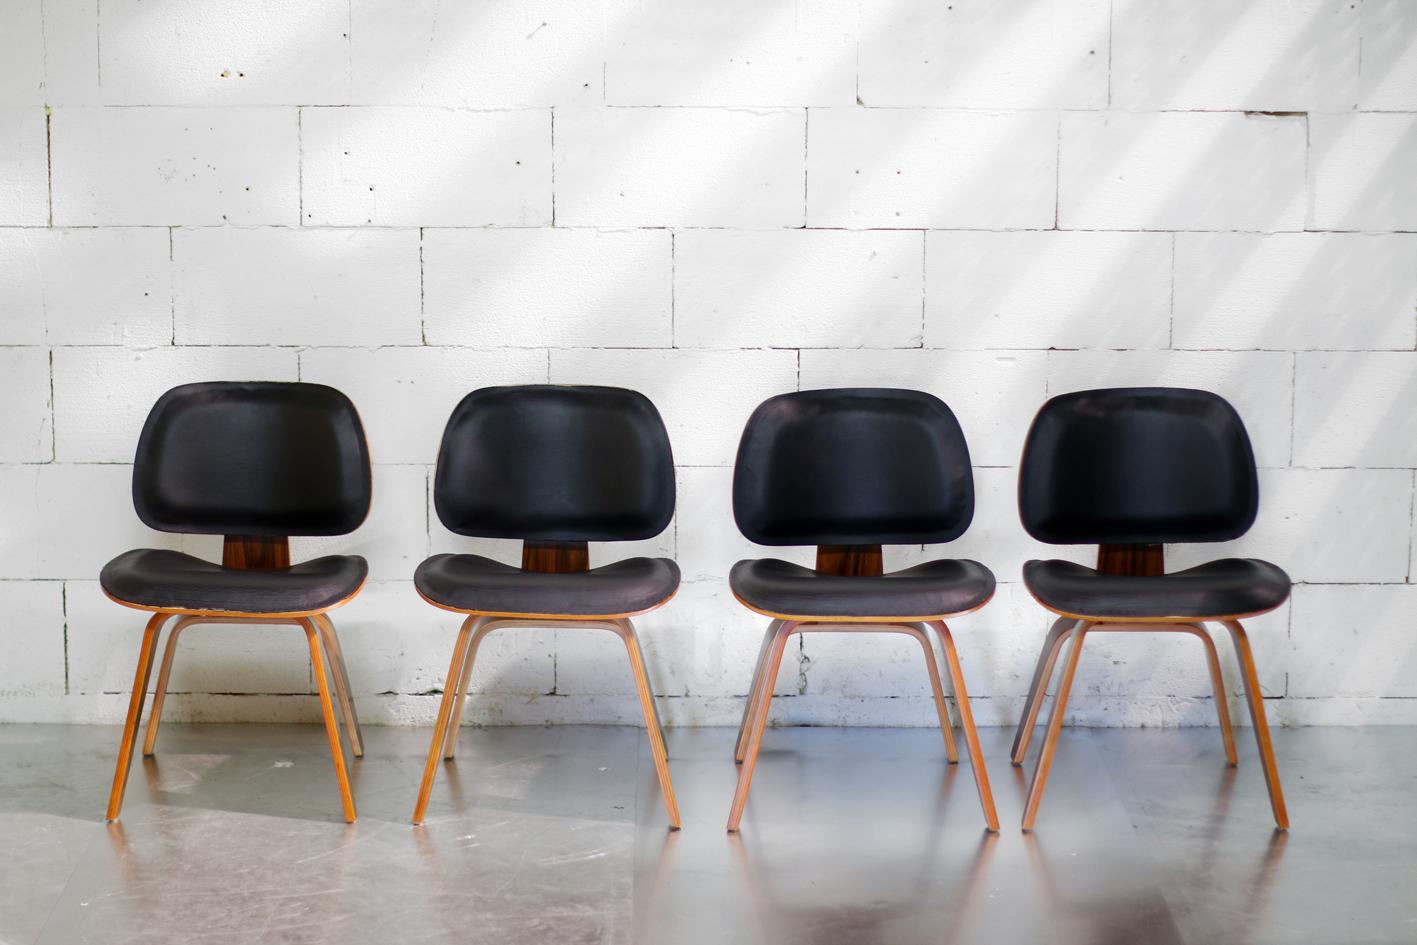 plywood en zwart skai eames lookalike design stoelen – dehuiszwaluw, Deco ideeën